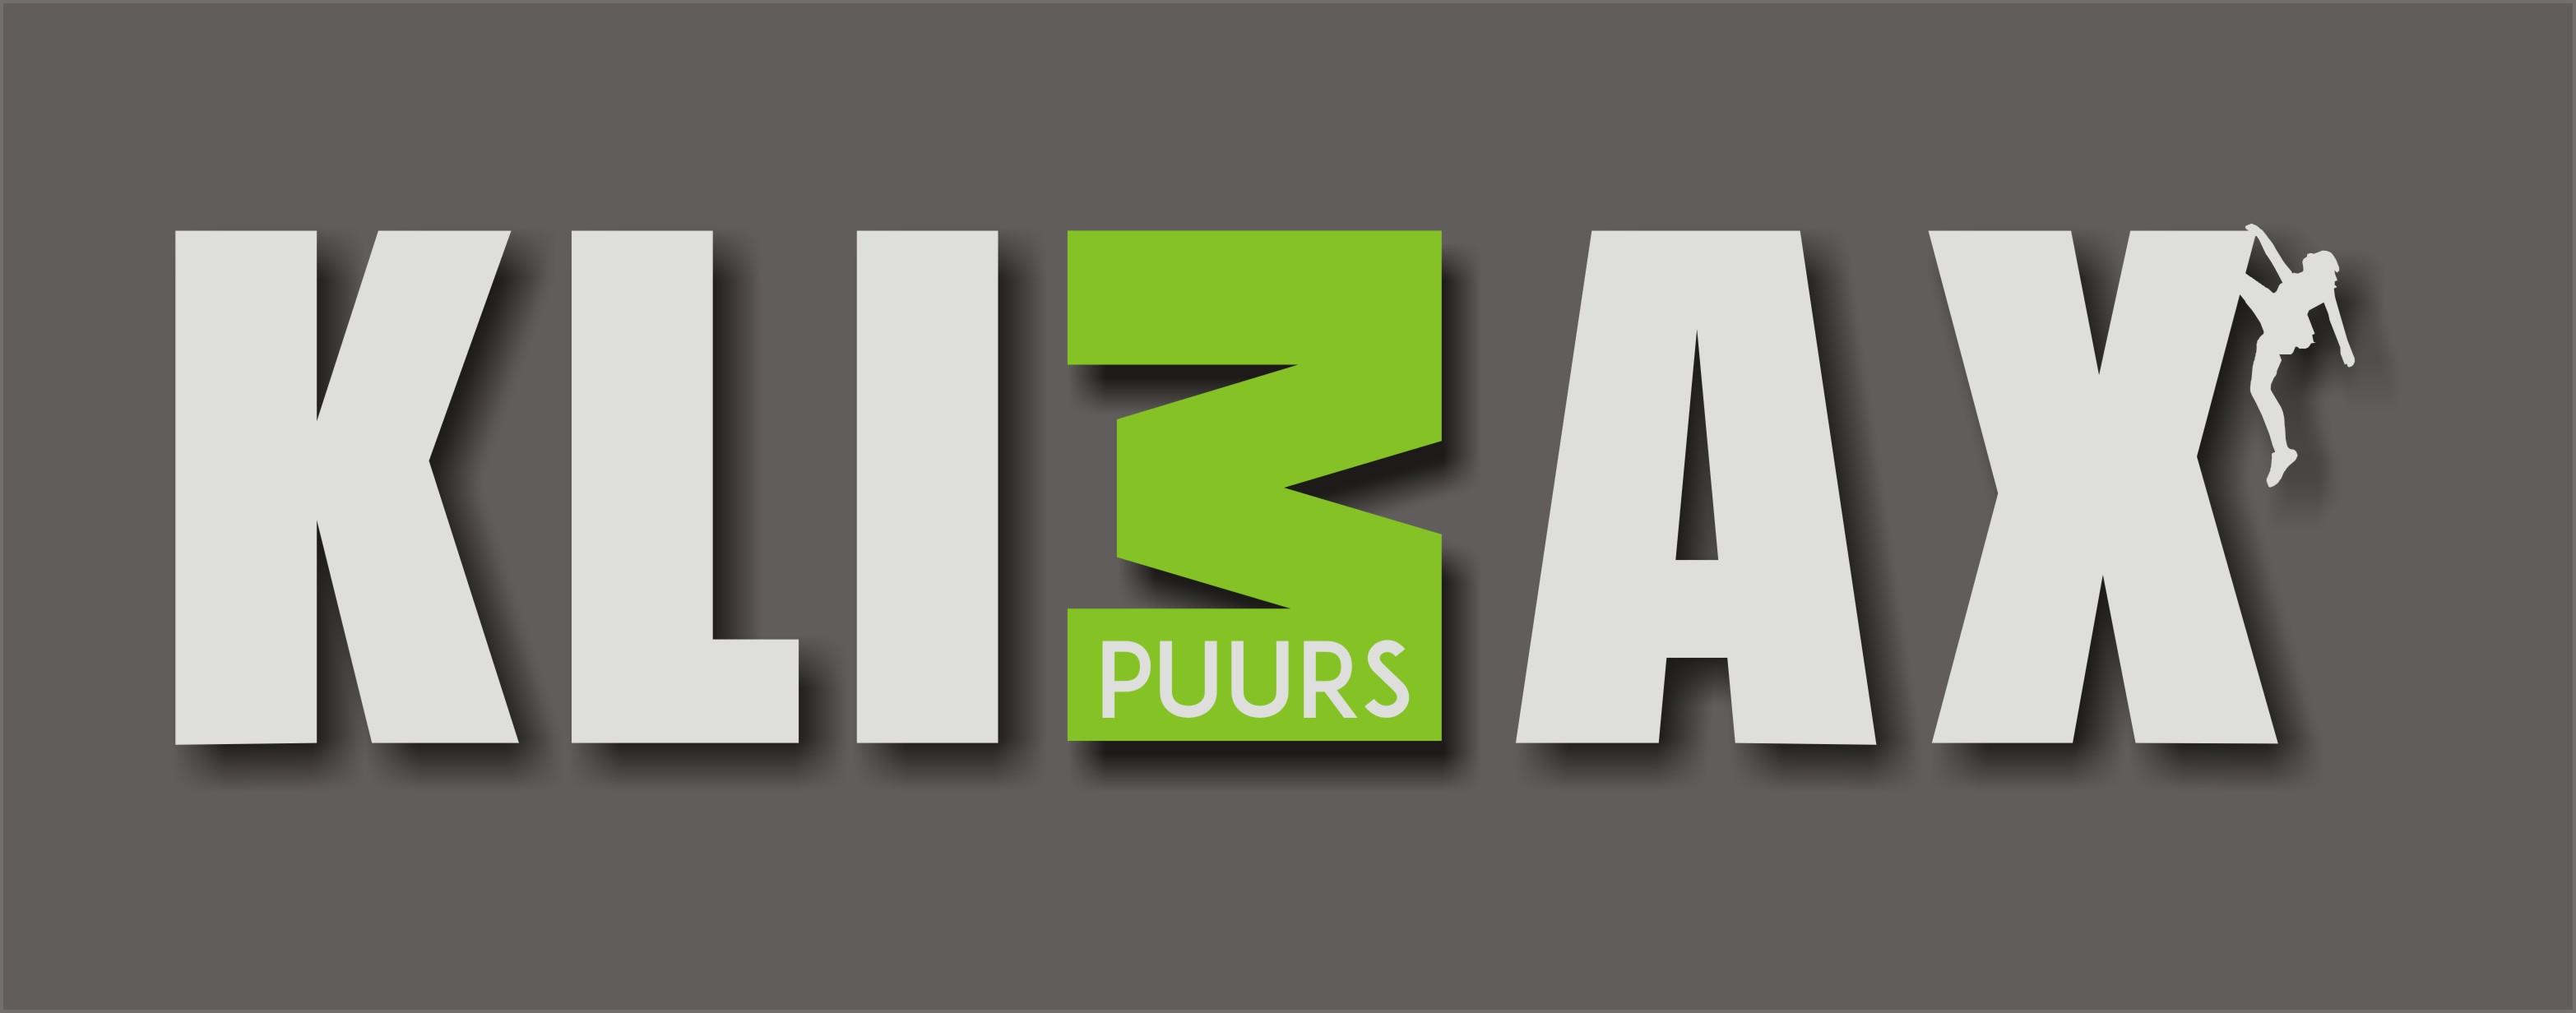 klimax_3_logo_2